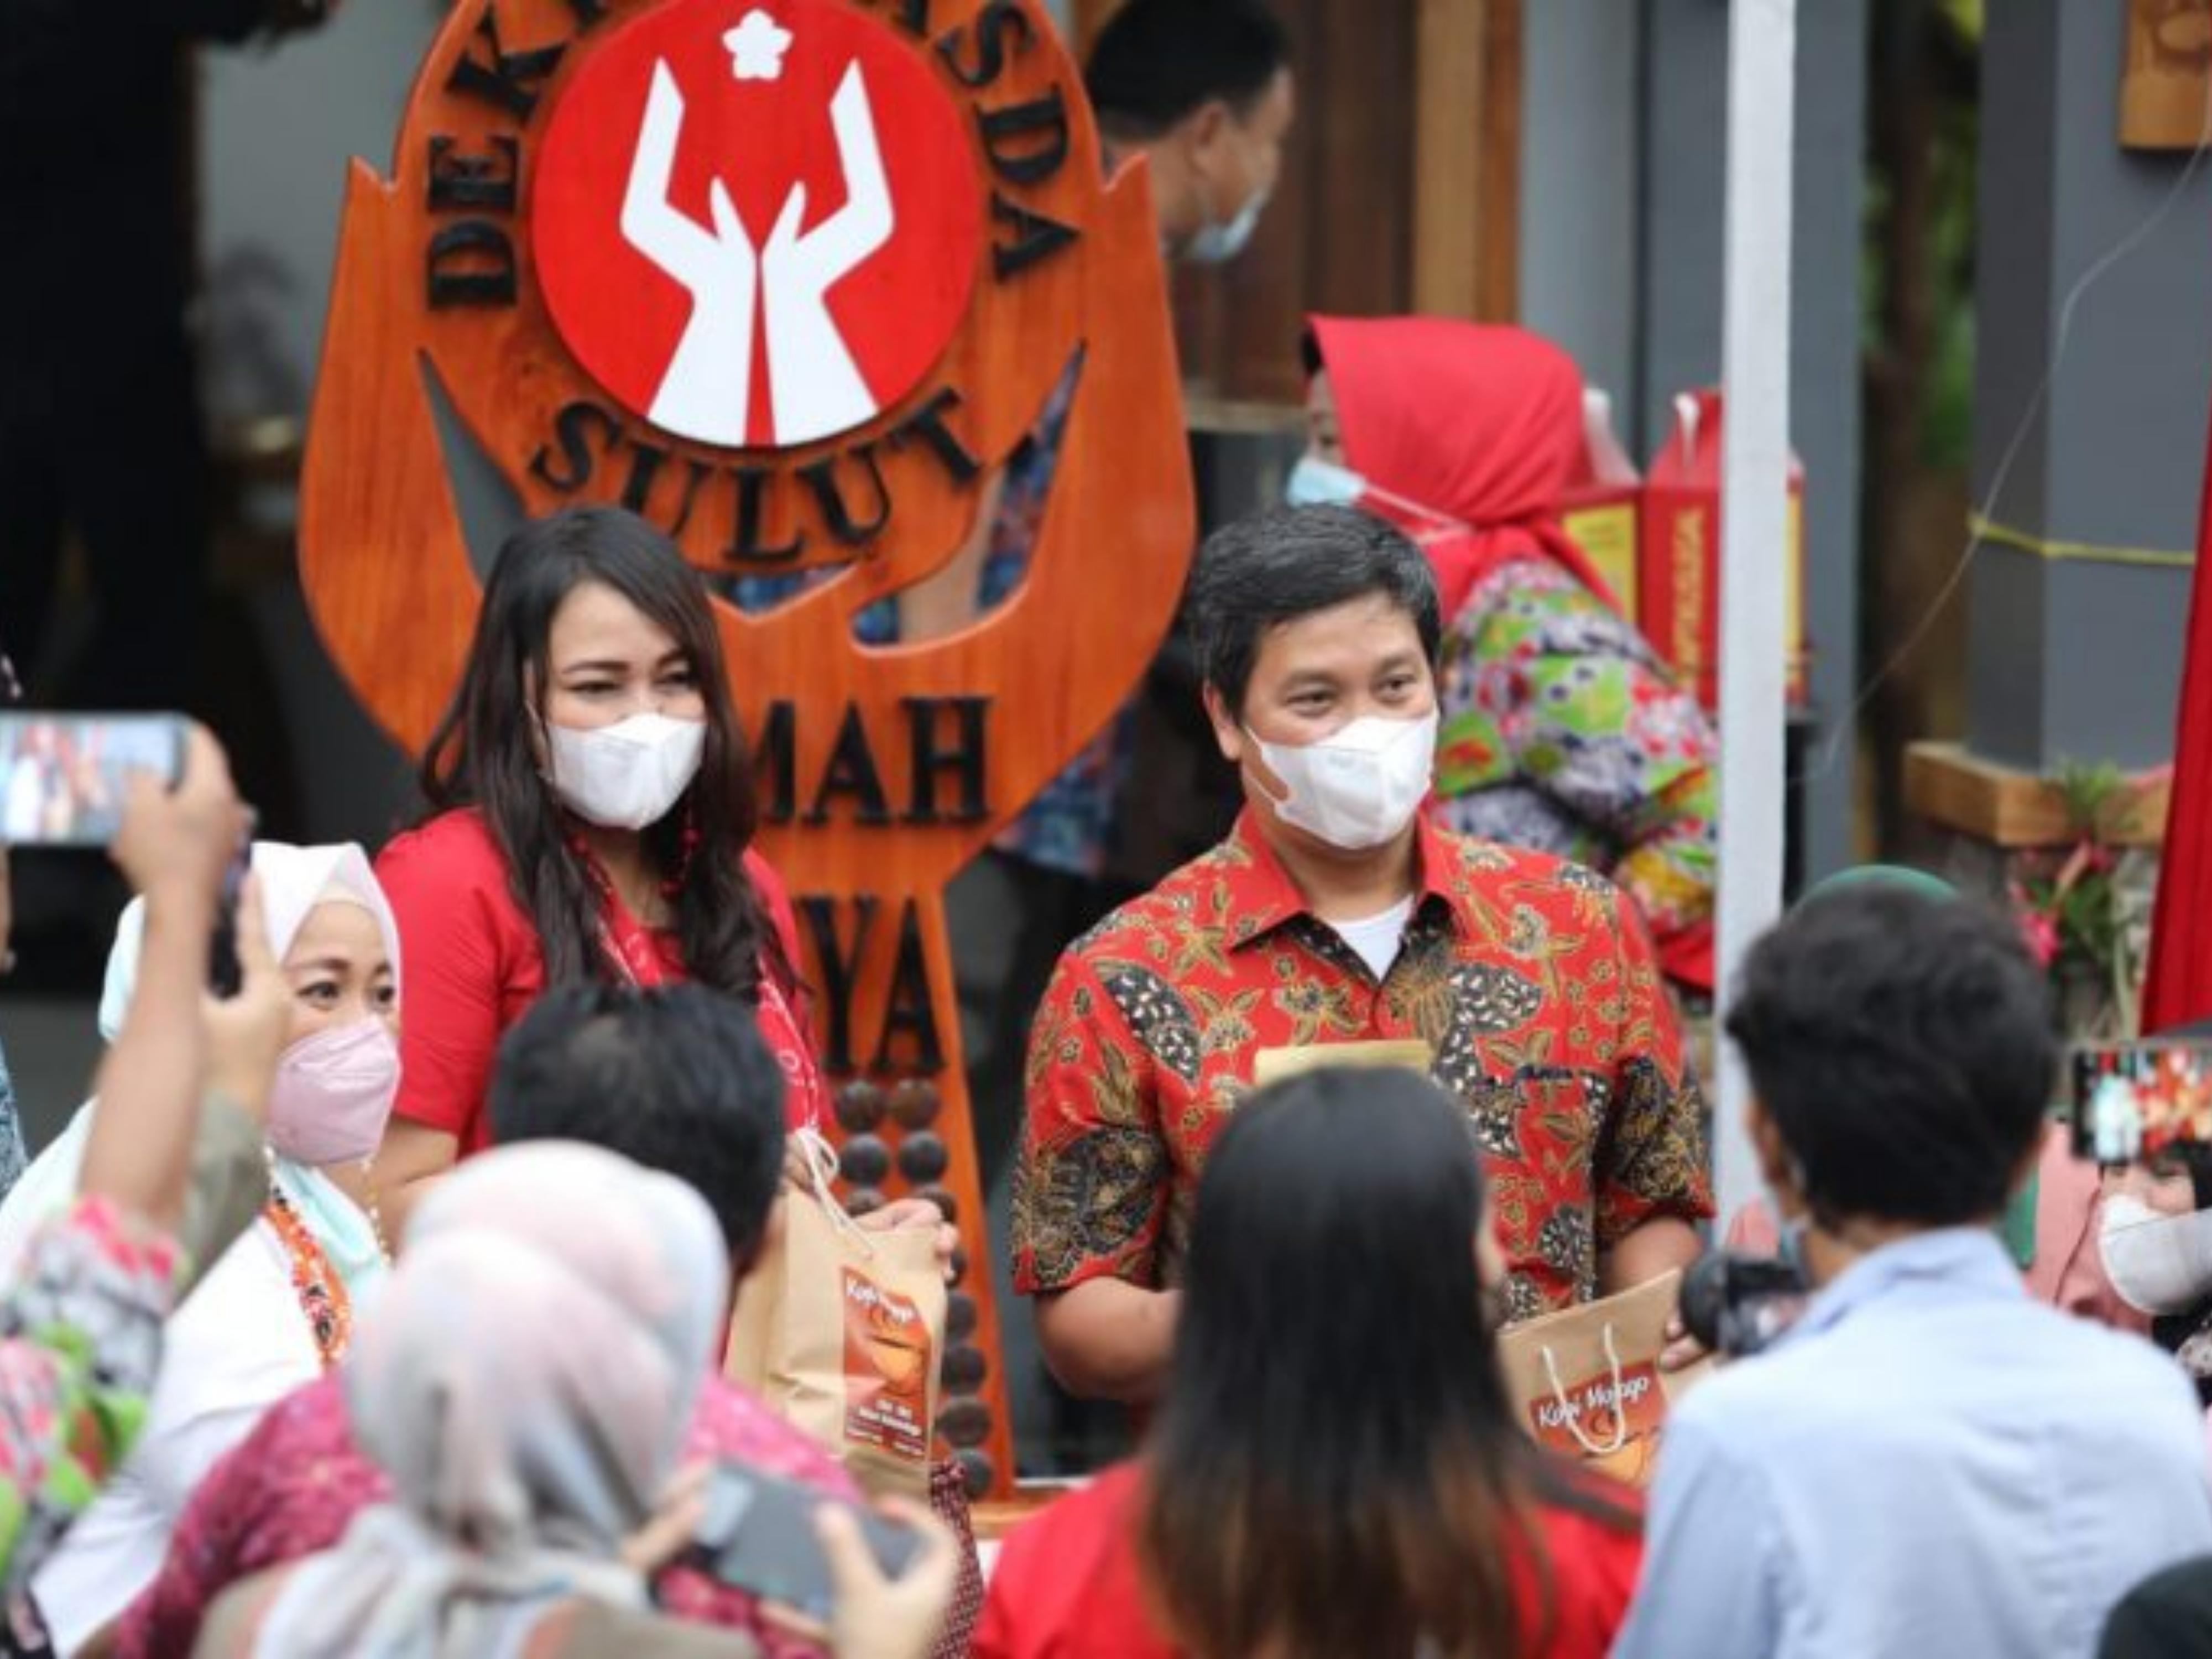 Dipimpin Presiden Jokowi, Wagub Steven Ikuti Rakor Hasil Pilkada 2020